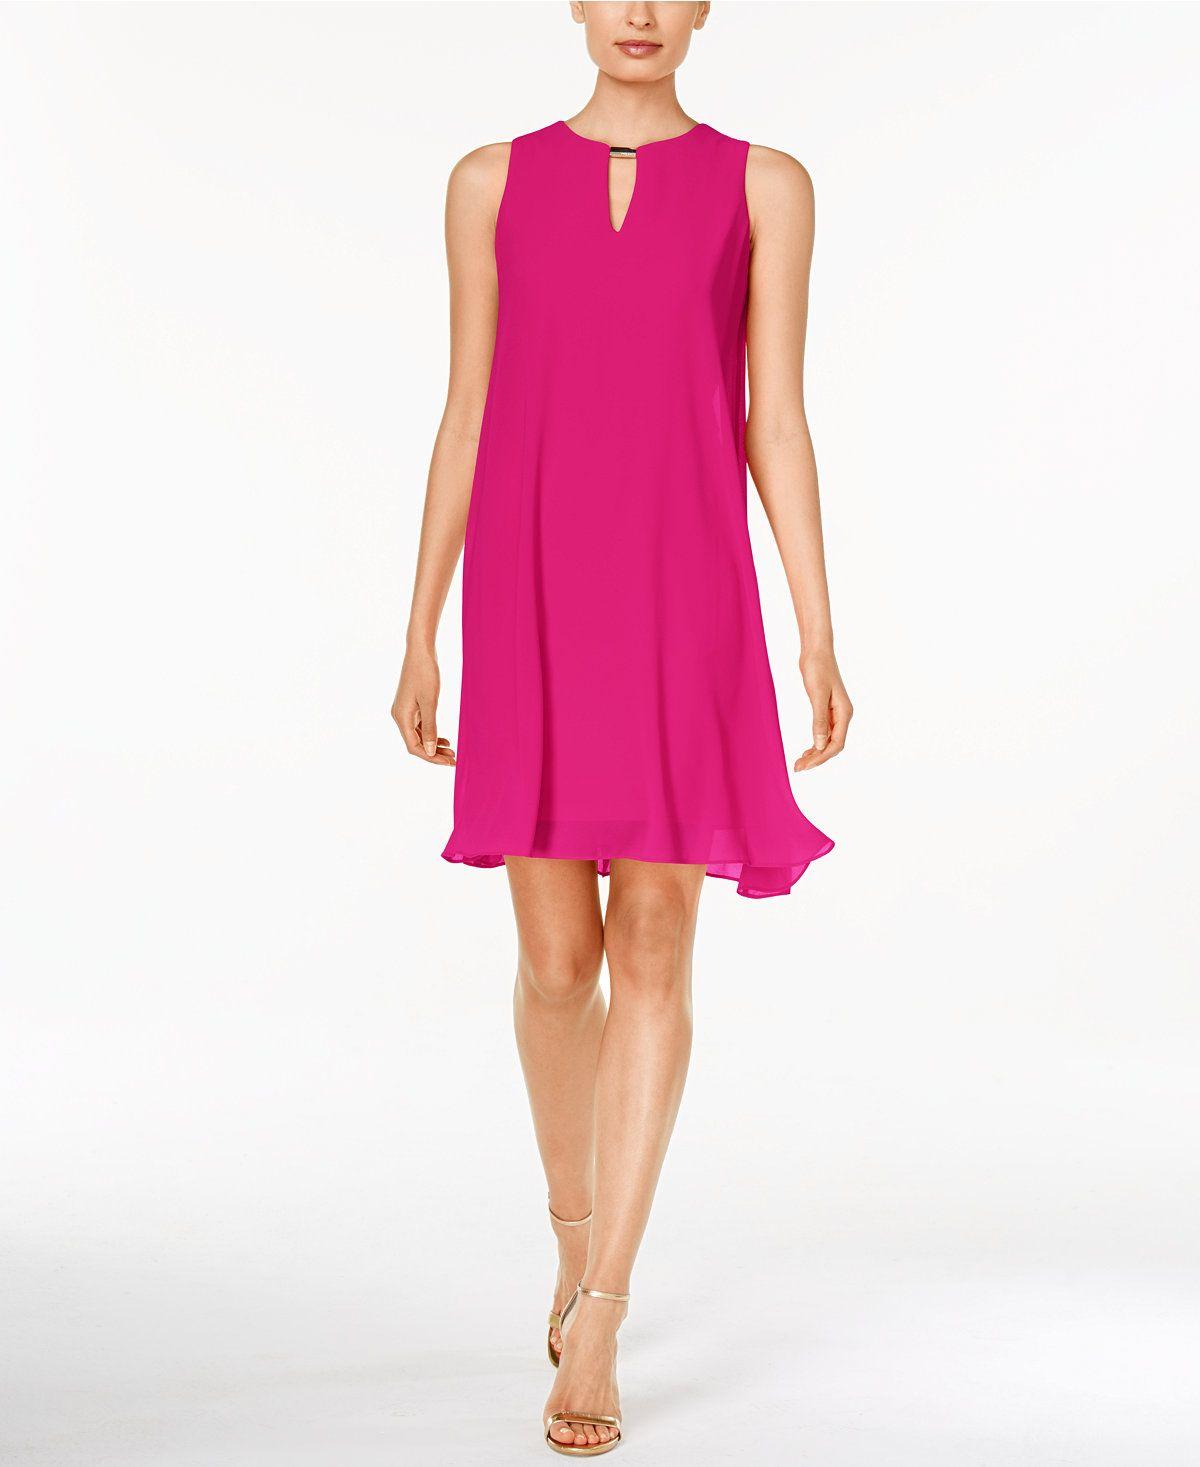 ece25ac5a3 Vince Camuto Sleeveless Keyhole Flyaway Dress - Dresses - Women - Macy s